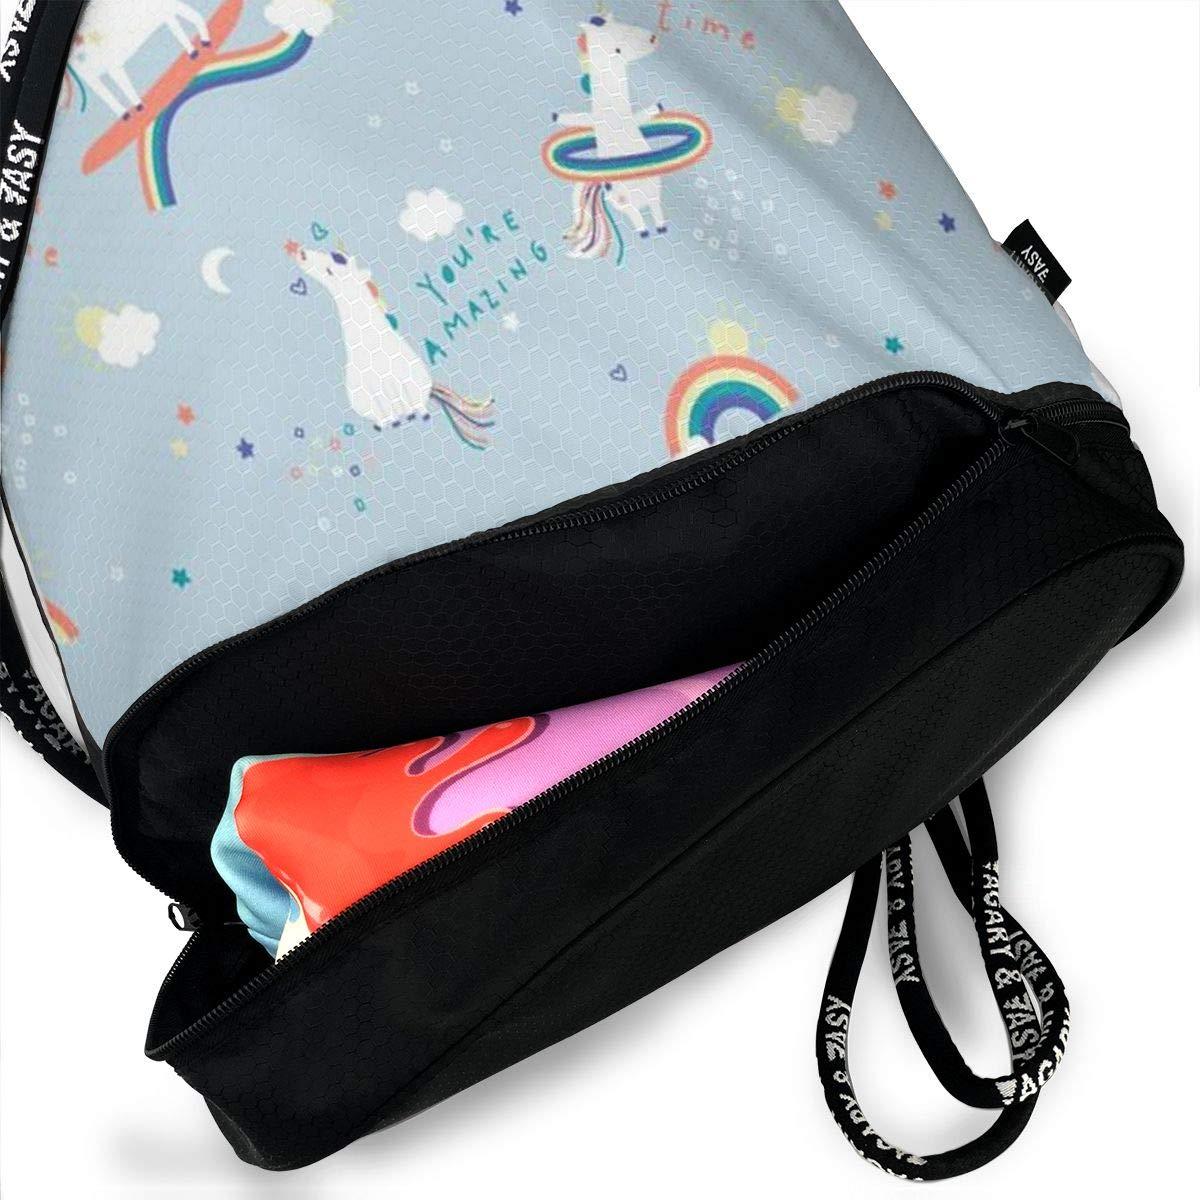 HUOPR5Q Unicorn Surf The Rainbow Drawstring Backpack Sport Gym Sack Shoulder Bulk Bag Dance Bag for School Travel